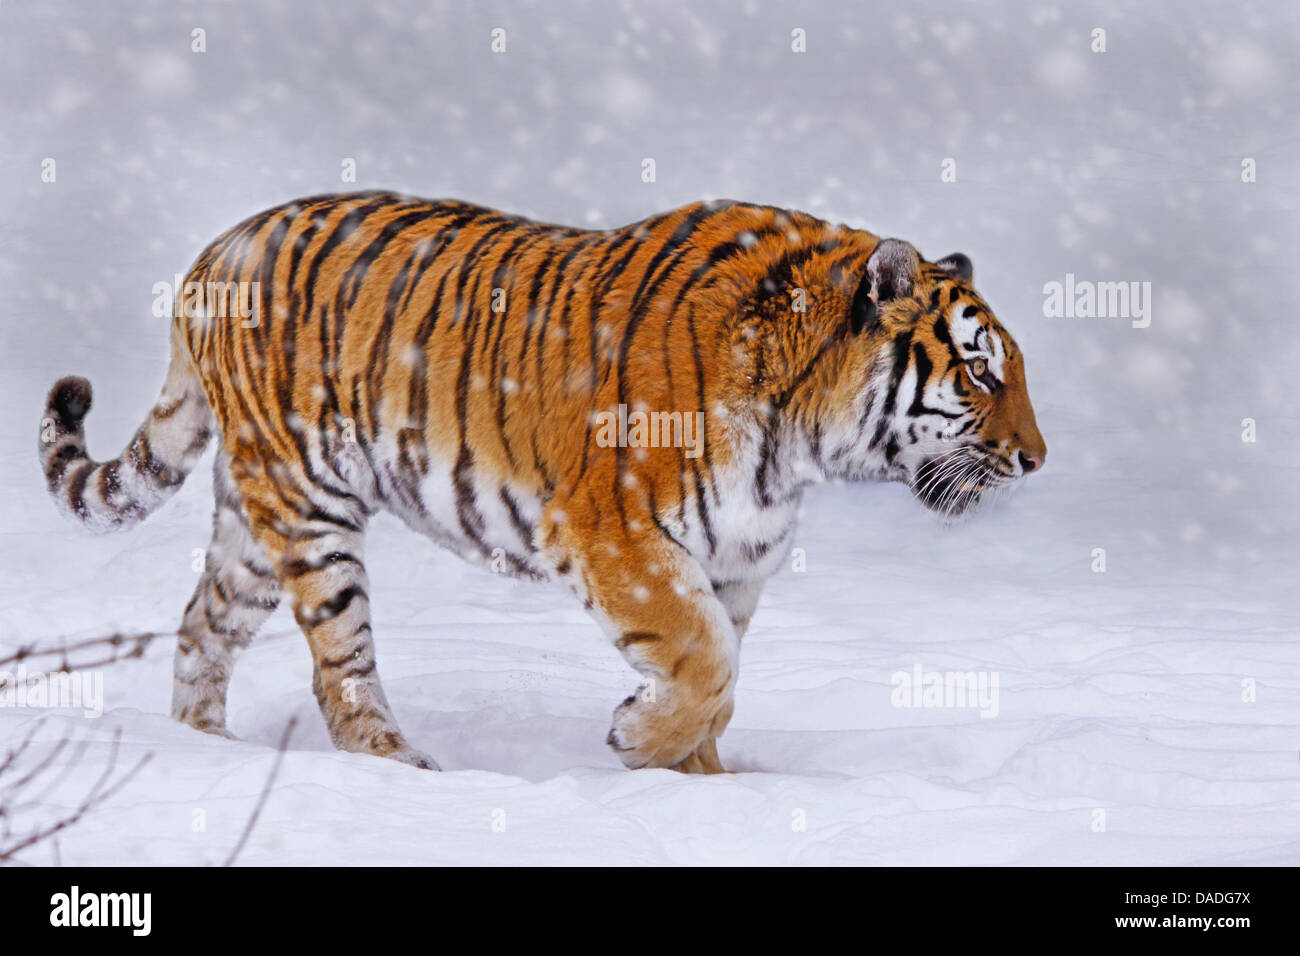 Tigre siberiano, Amurian tigre (Panthera tigris altaica), paseos a través de la nieve Foto de stock